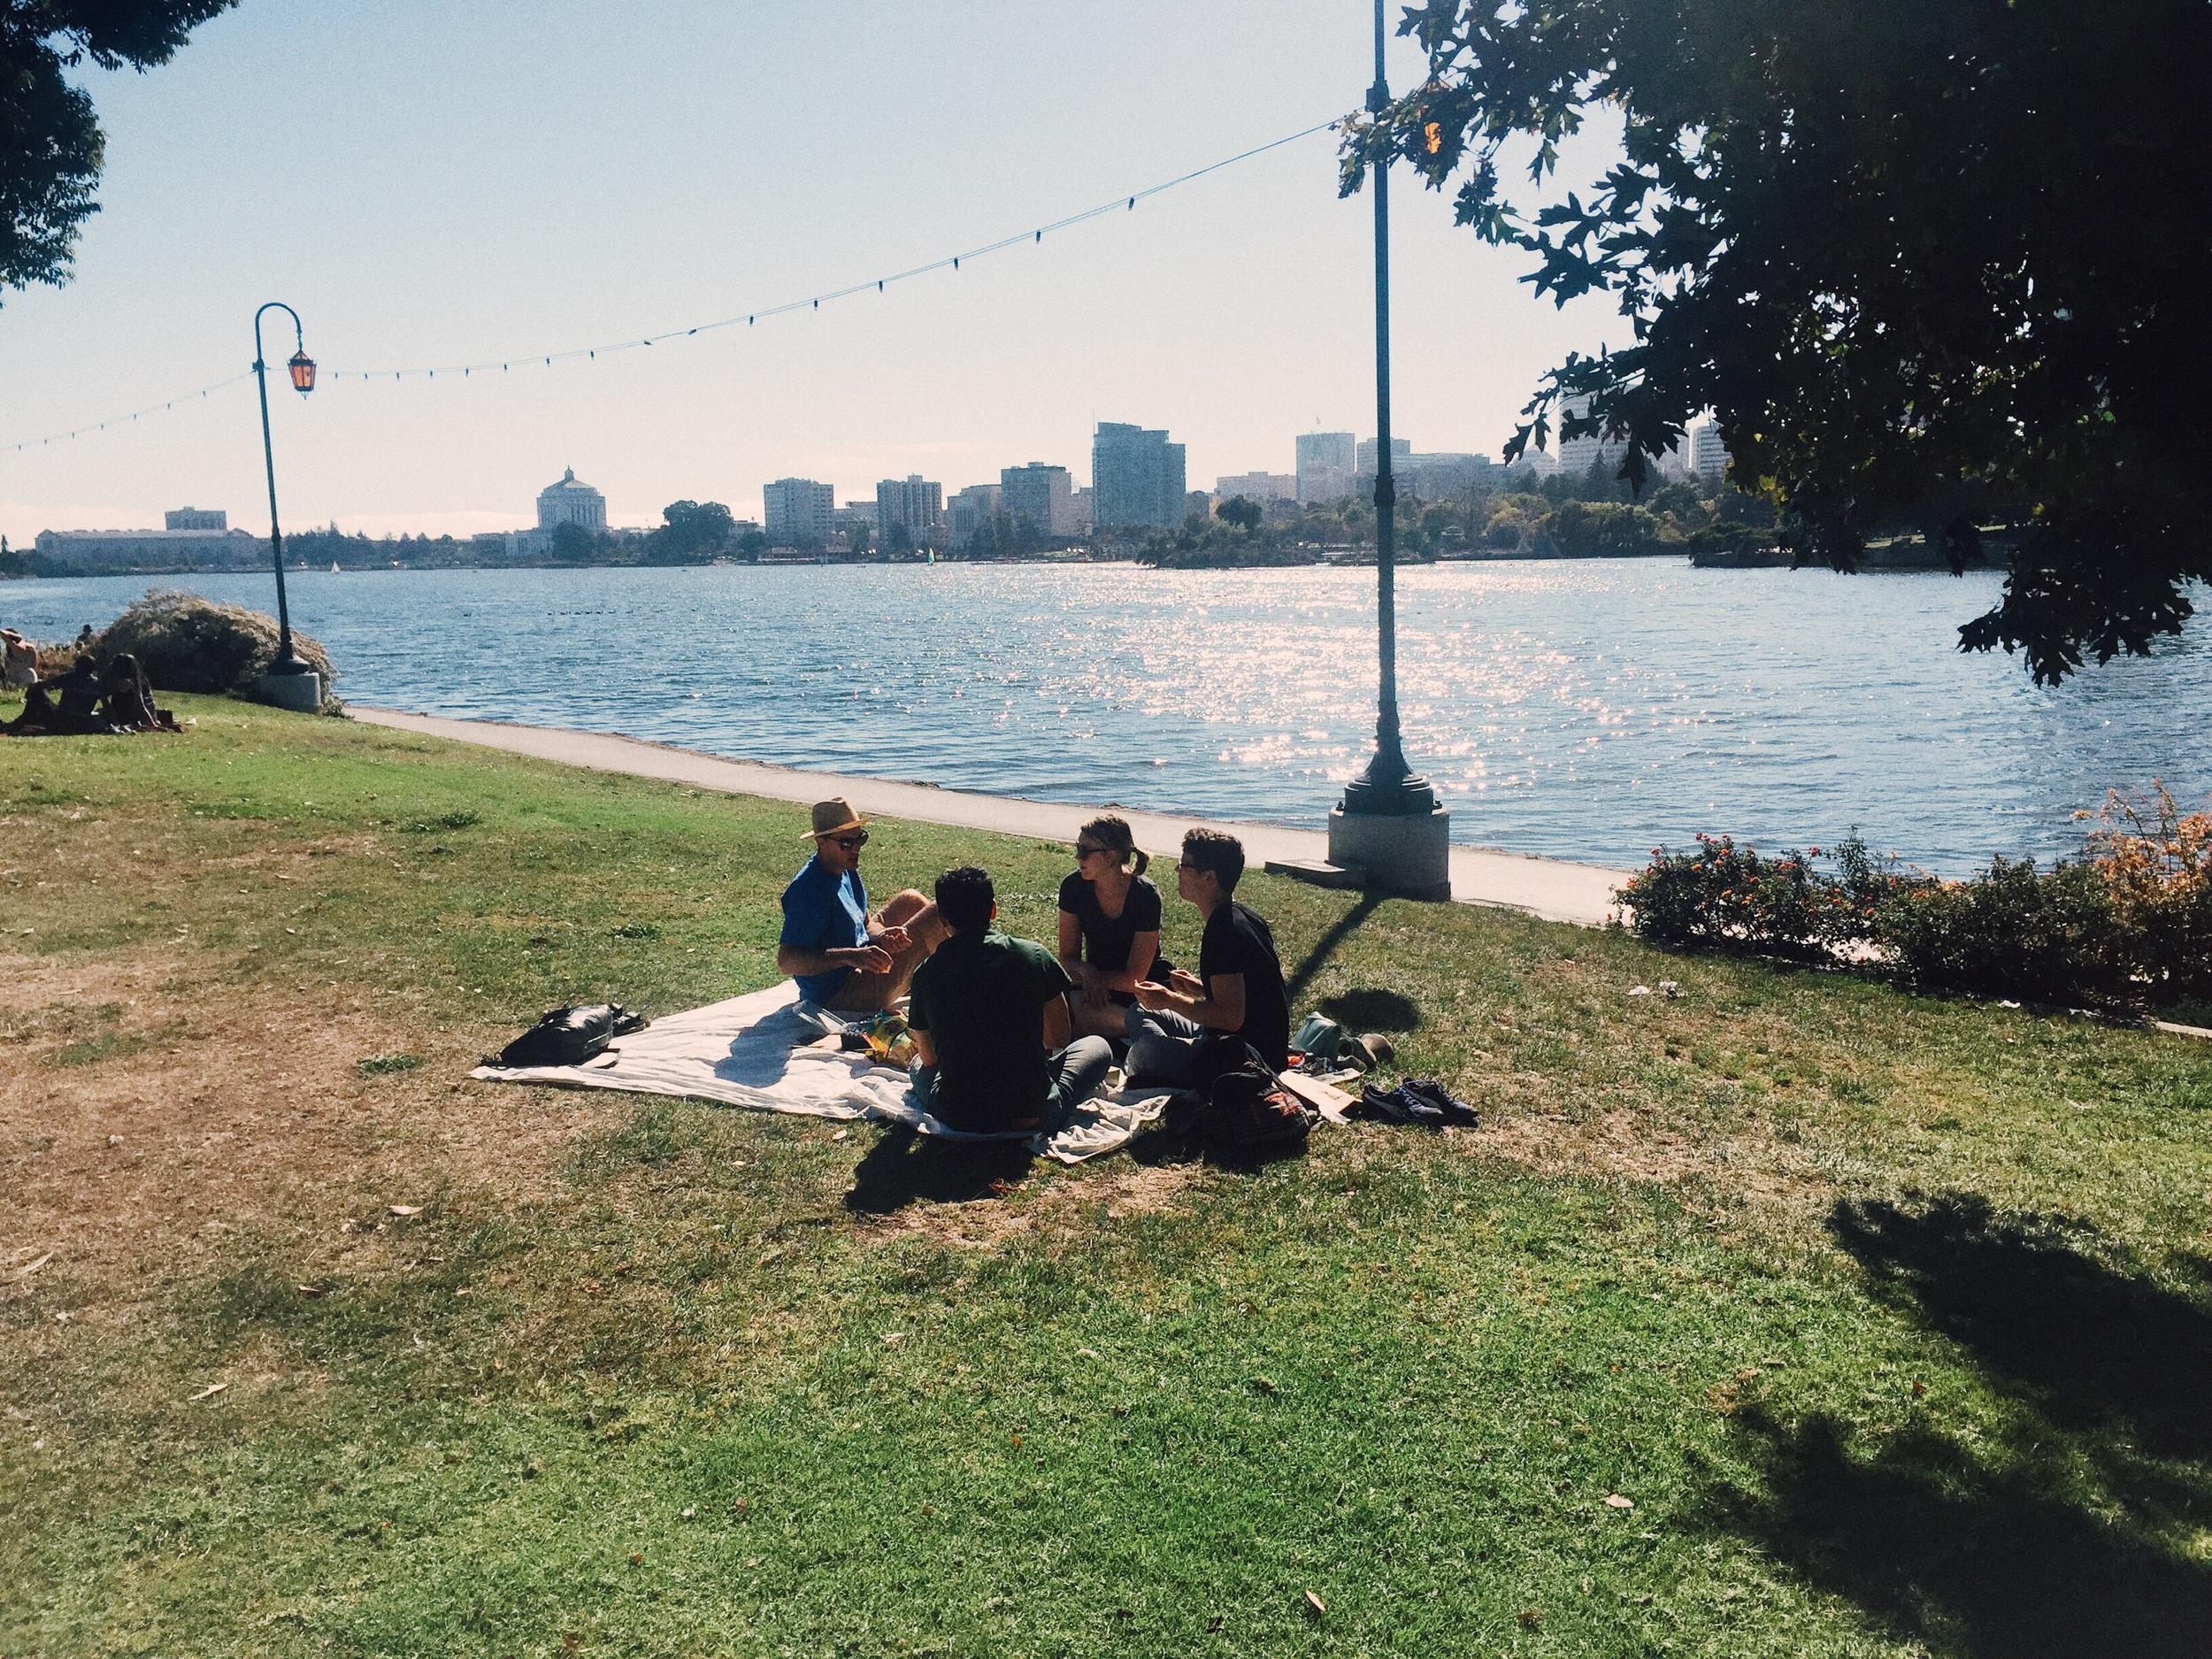 Sunday picnic by Lake Merrit, August '15